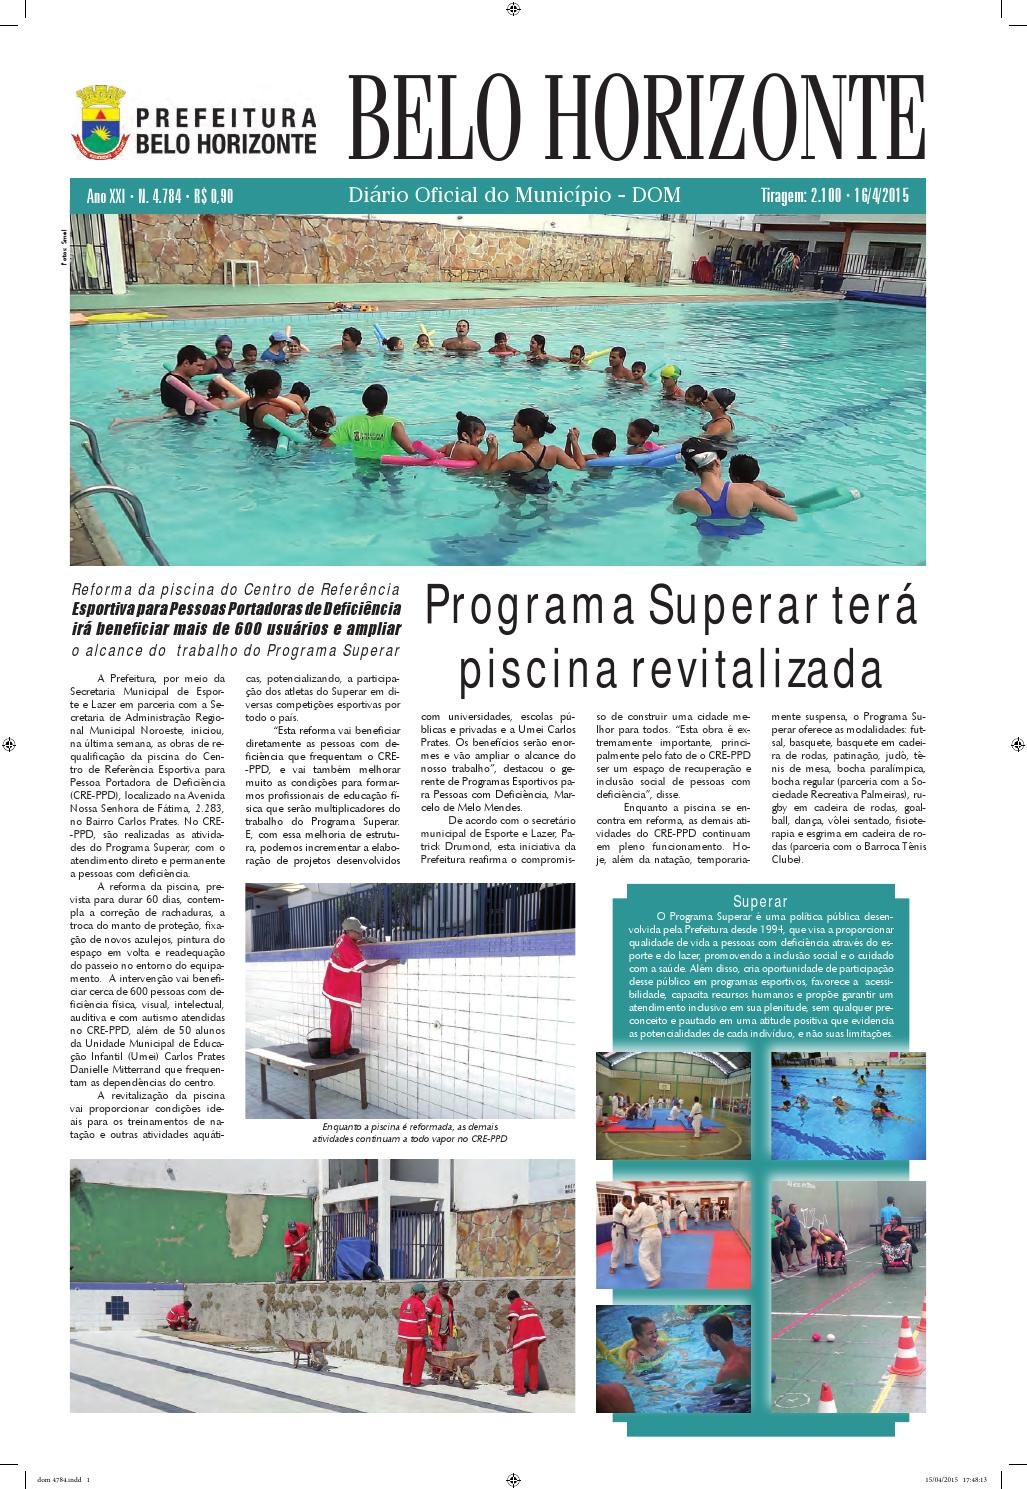 5a5acc996 DOM - 16 04 2015 by Prefeitura Belo Horizonte - issuu